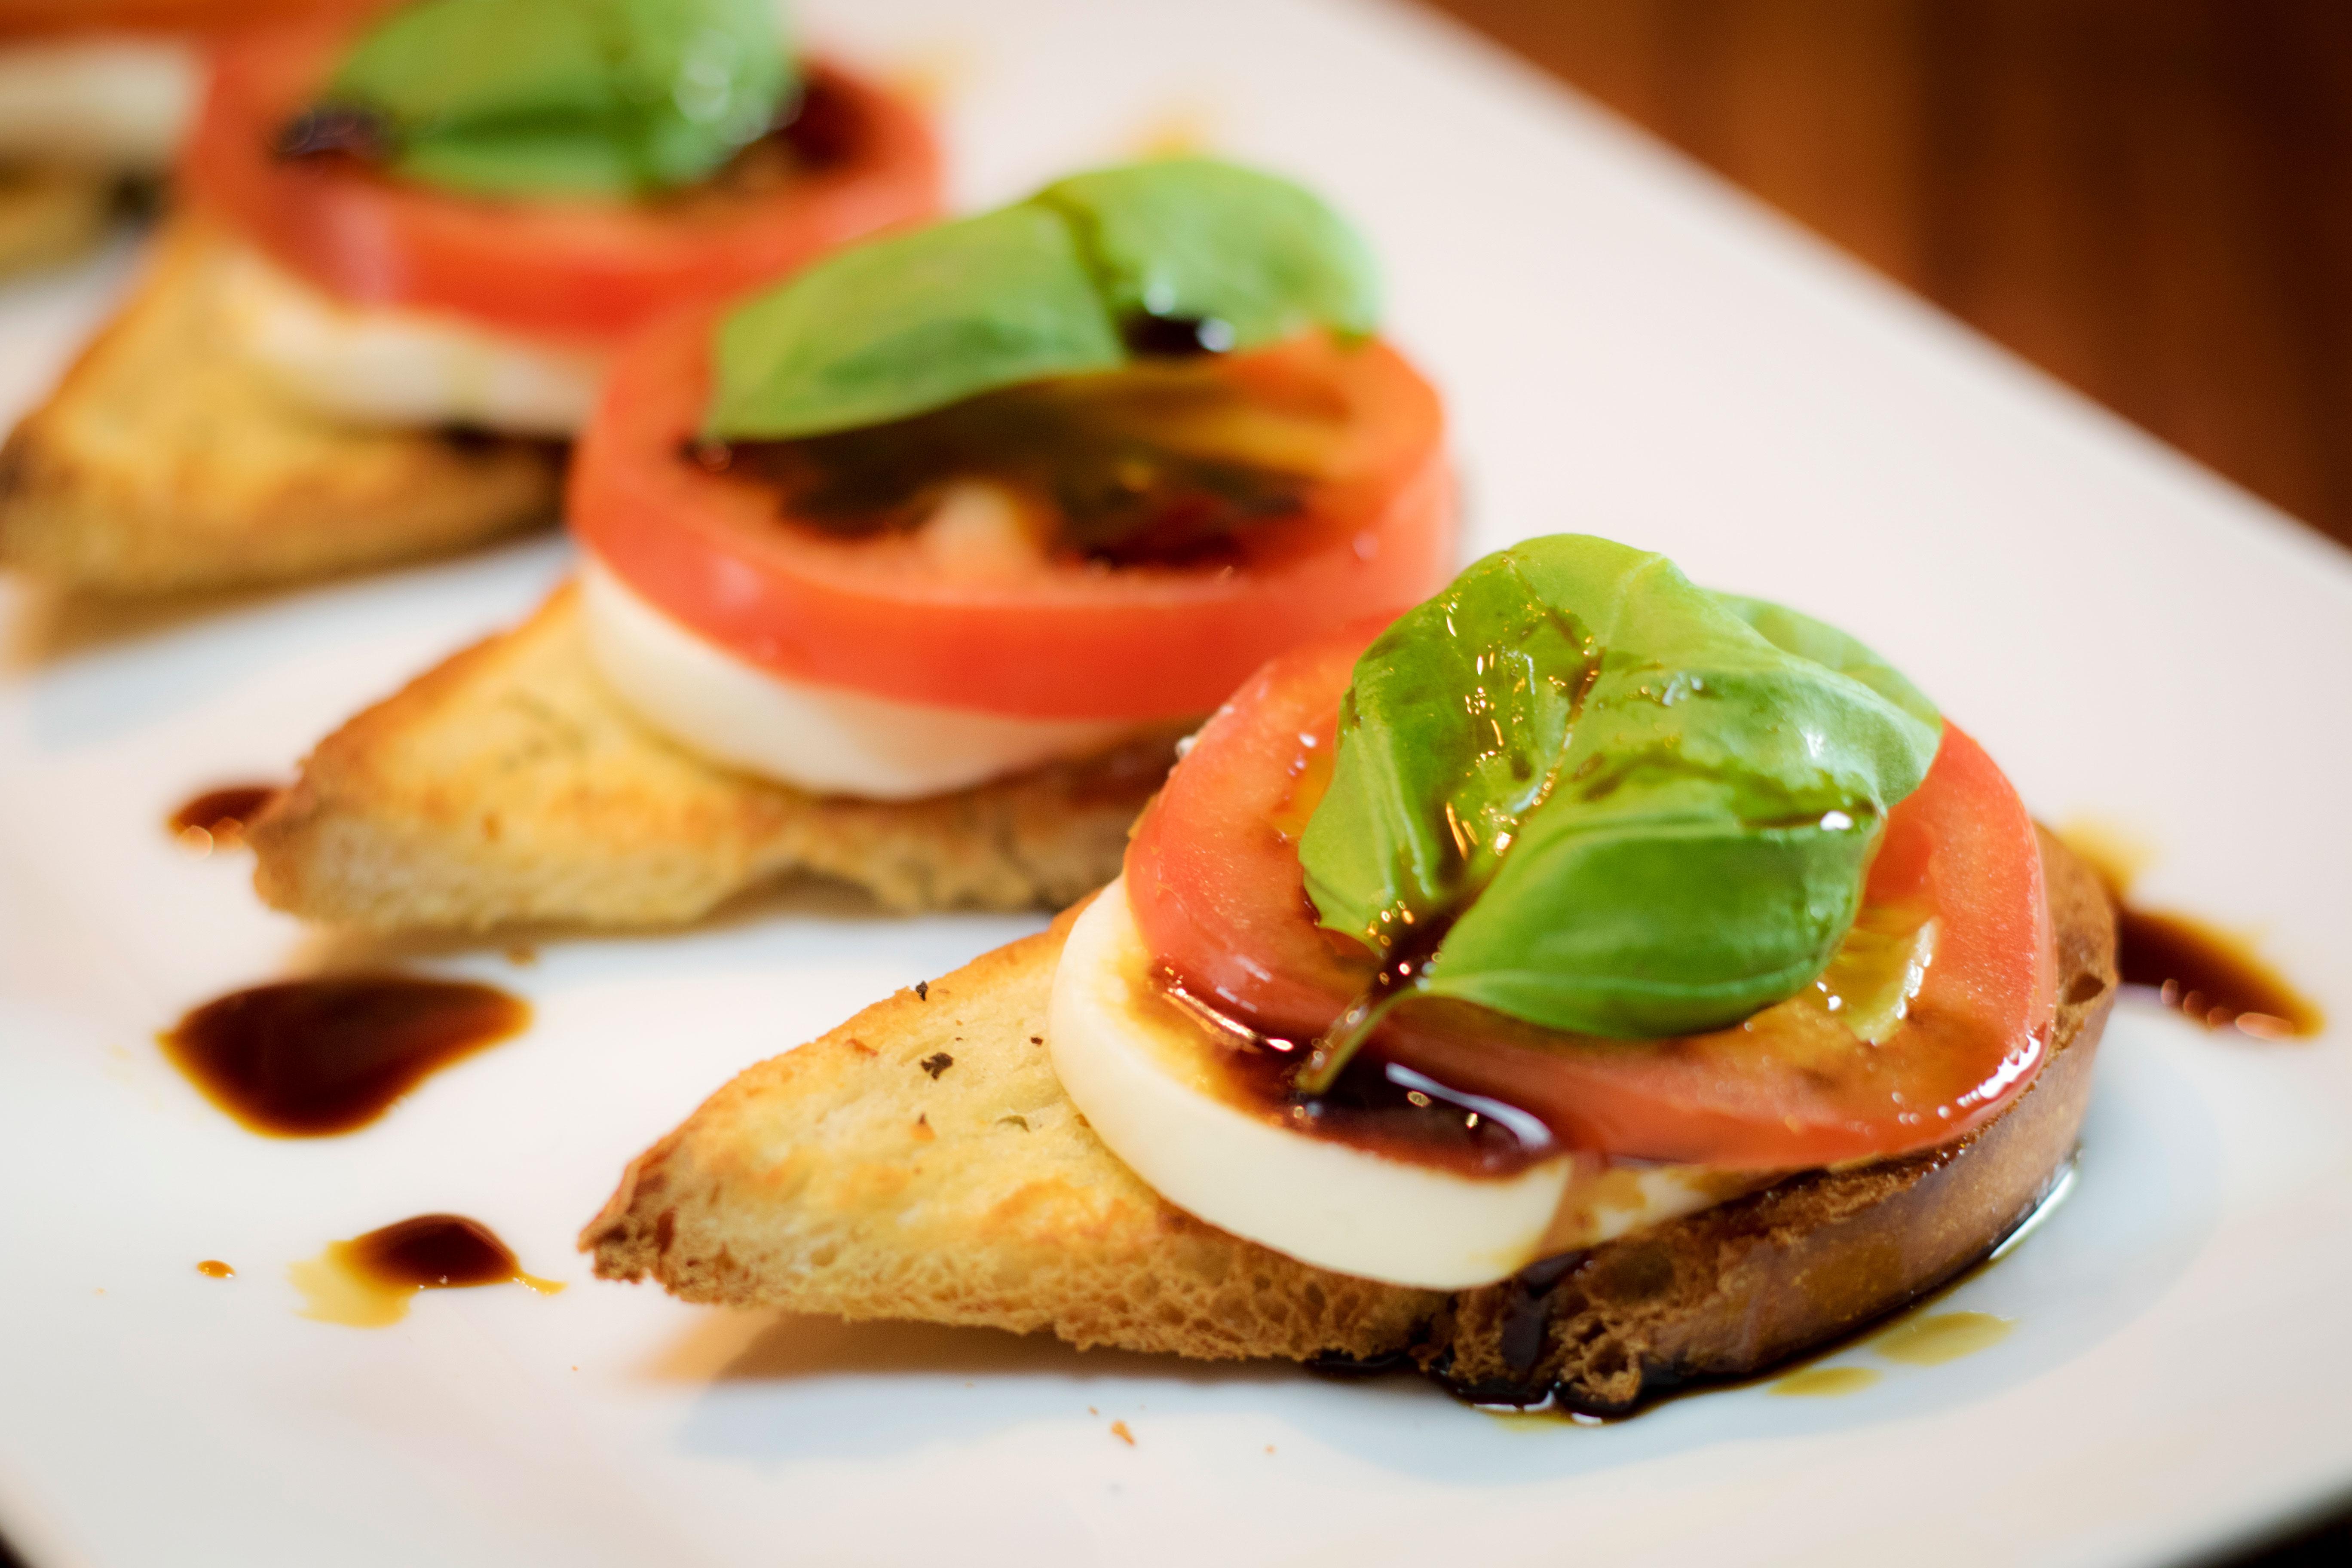 Caprese Garlic Bread is a great twist on a classic Italian side.